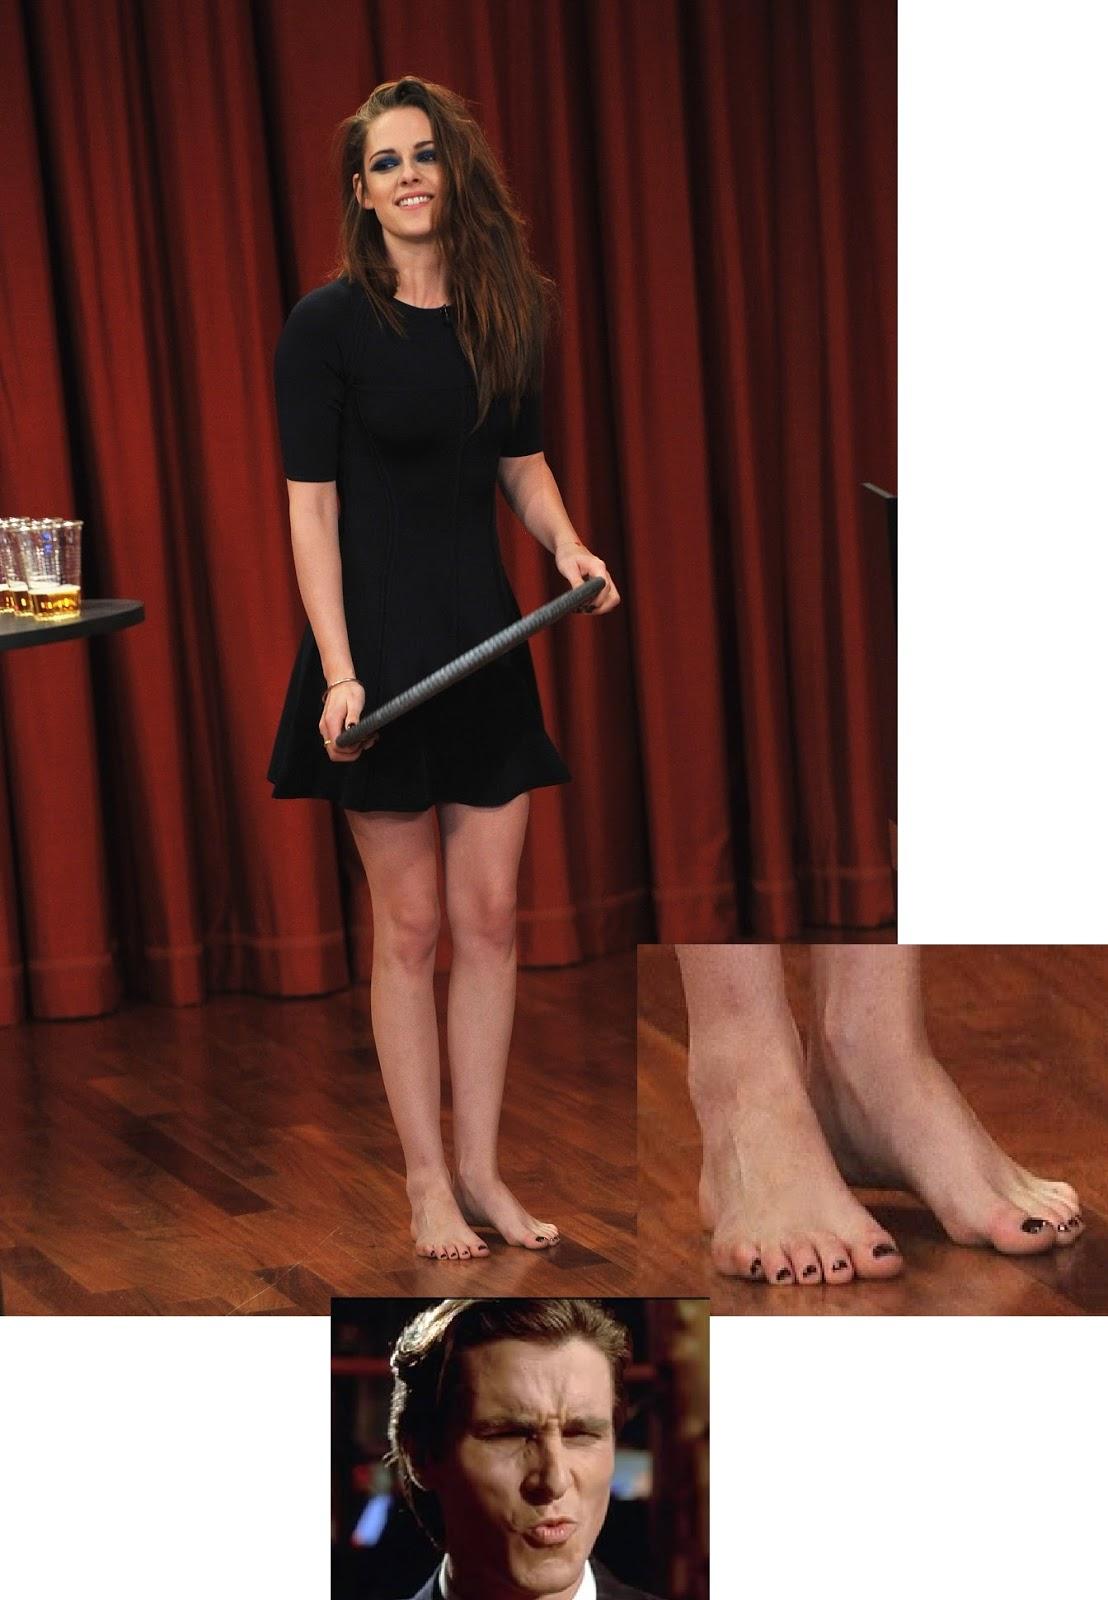 http://2.bp.blogspot.com/-q79va-0ksak/USV61TmnbEI/AAAAAAAABp0/jqkMBfTA7Ik/s1600/Kristen-Stewart-Feet.jpg